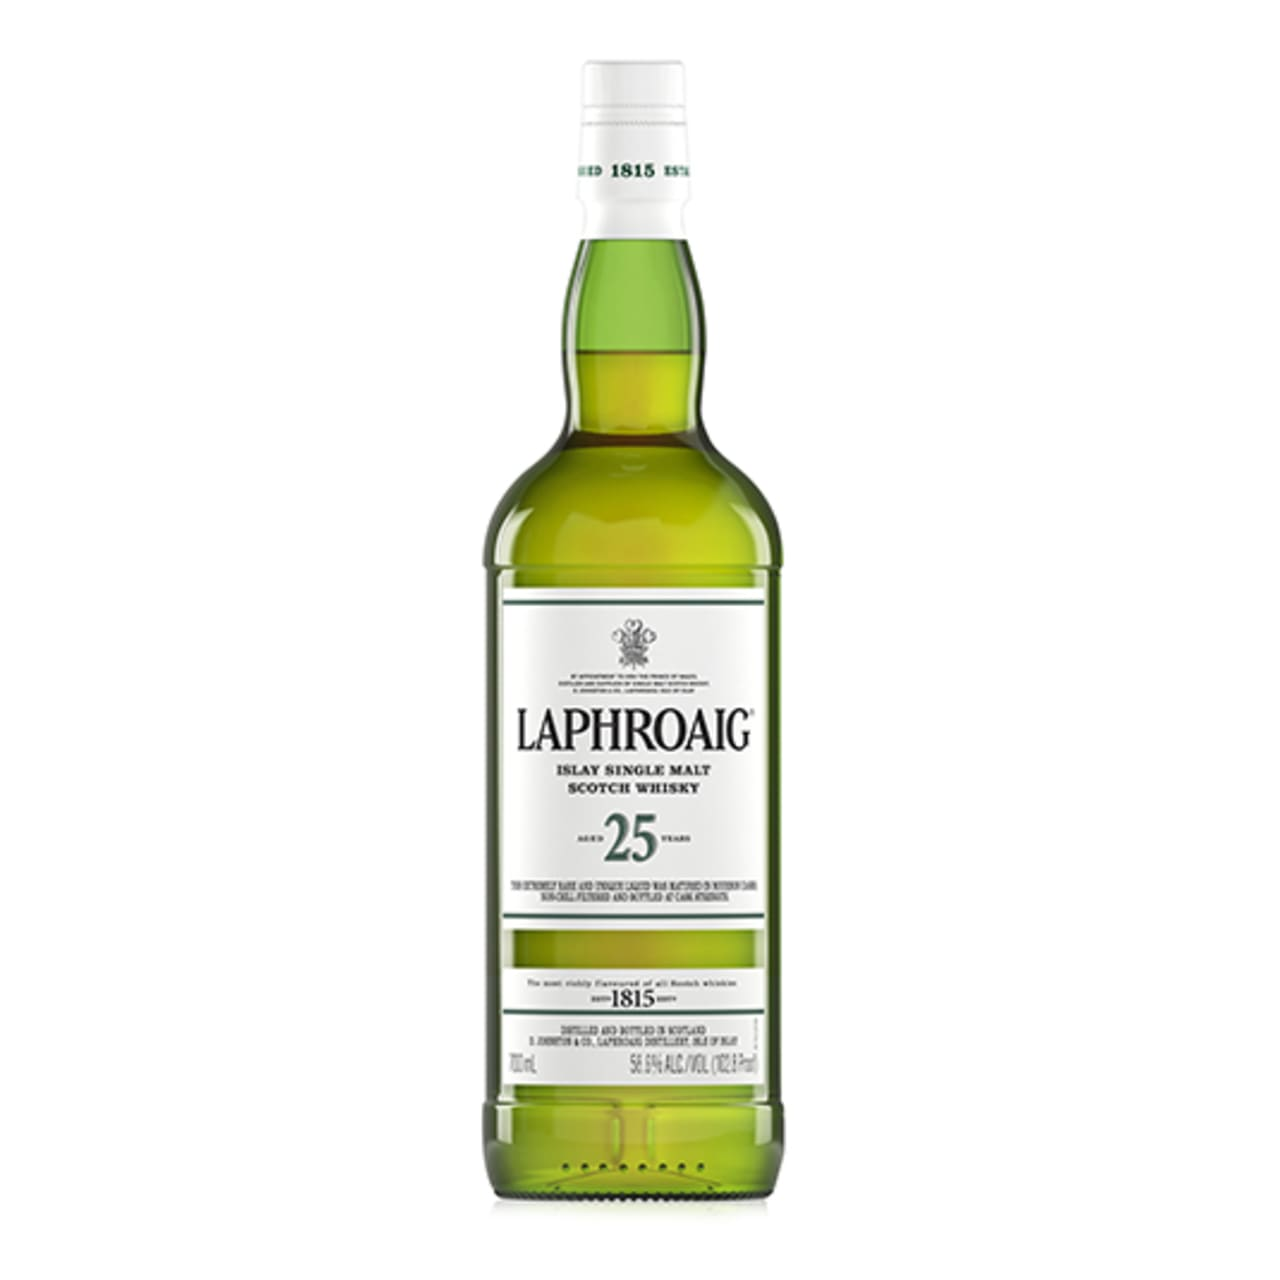 Product Image - Laphroaig 25yo Cask Strength